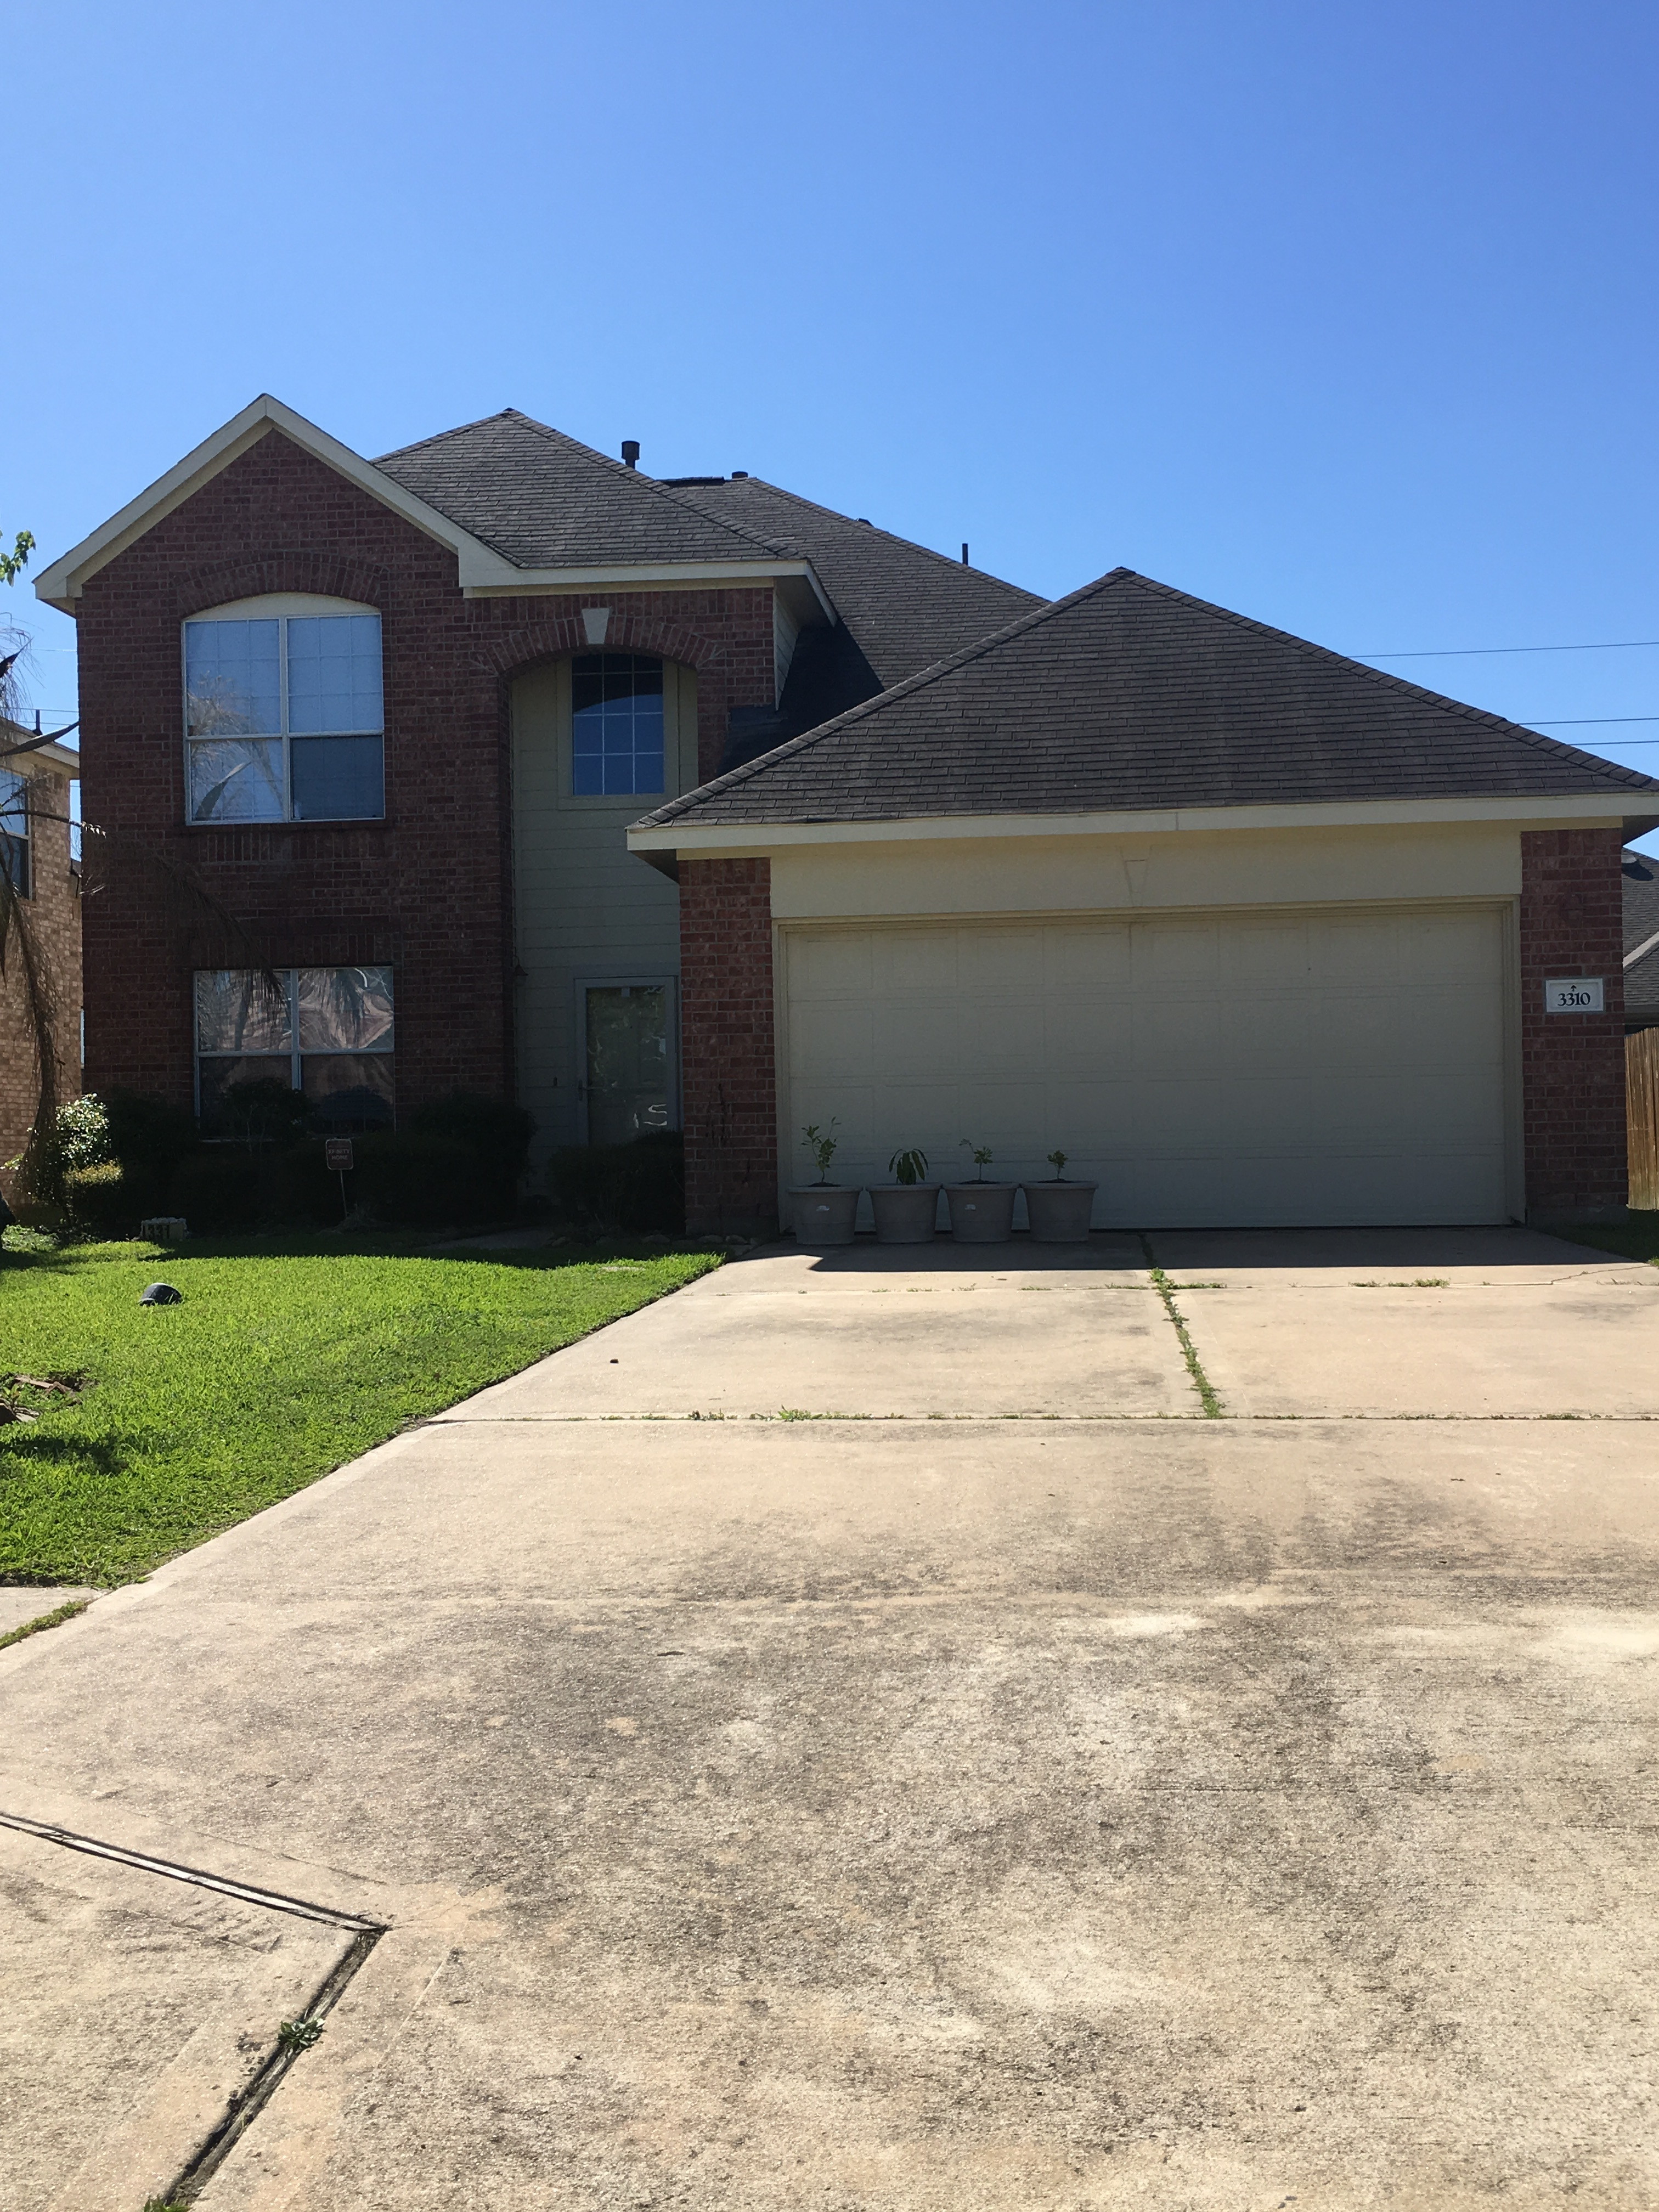 Photo of 3310 Barnes Ln, Manvel, TX, 77578